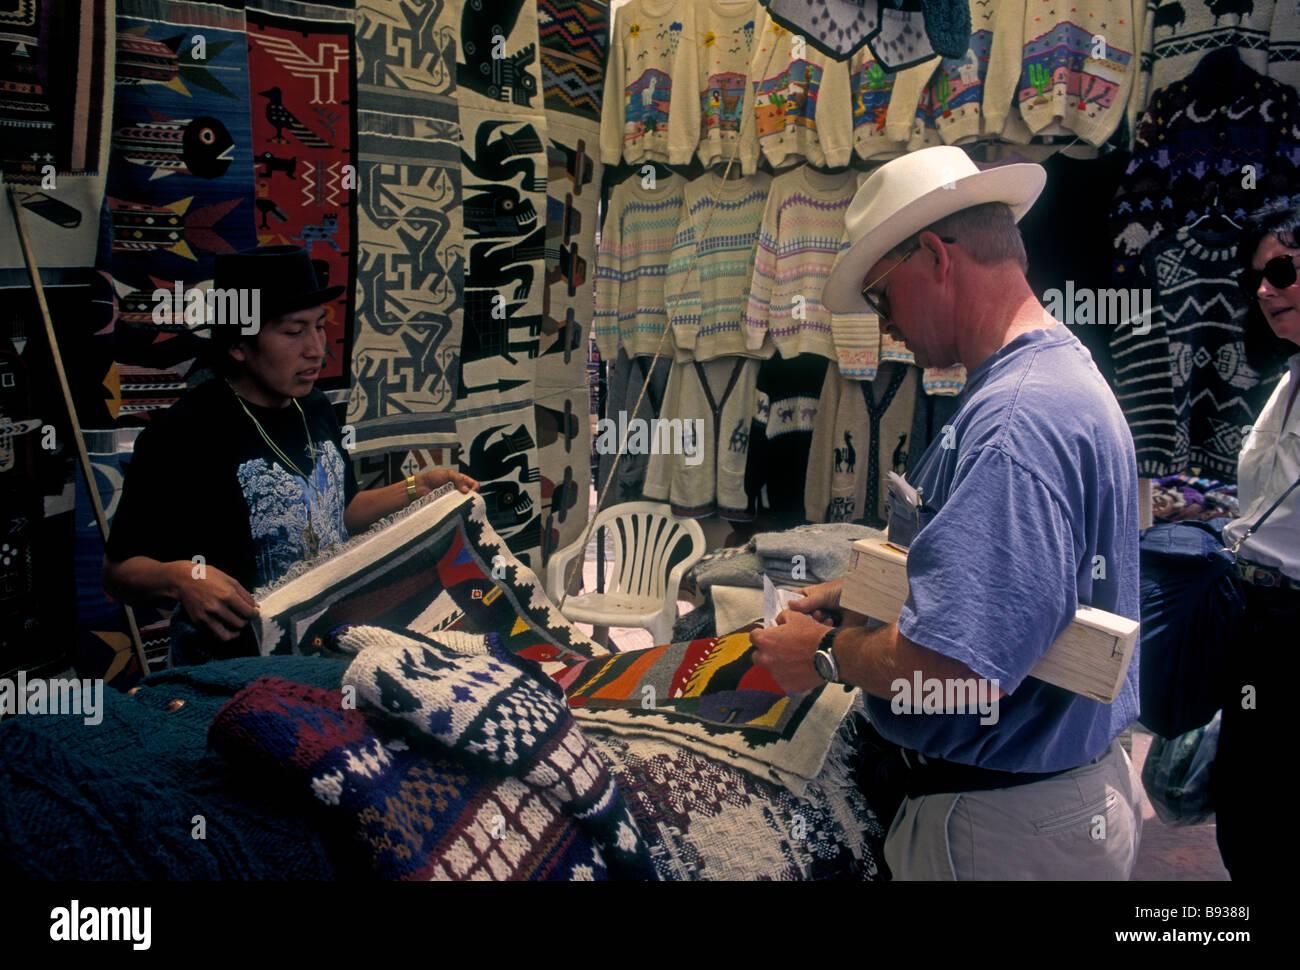 Ecuadoran man, adult man, vendor, Otavalo Market, Indian market, Plaza de Ponchos, town of Otavalo, Imbabura Province, - Stock Image